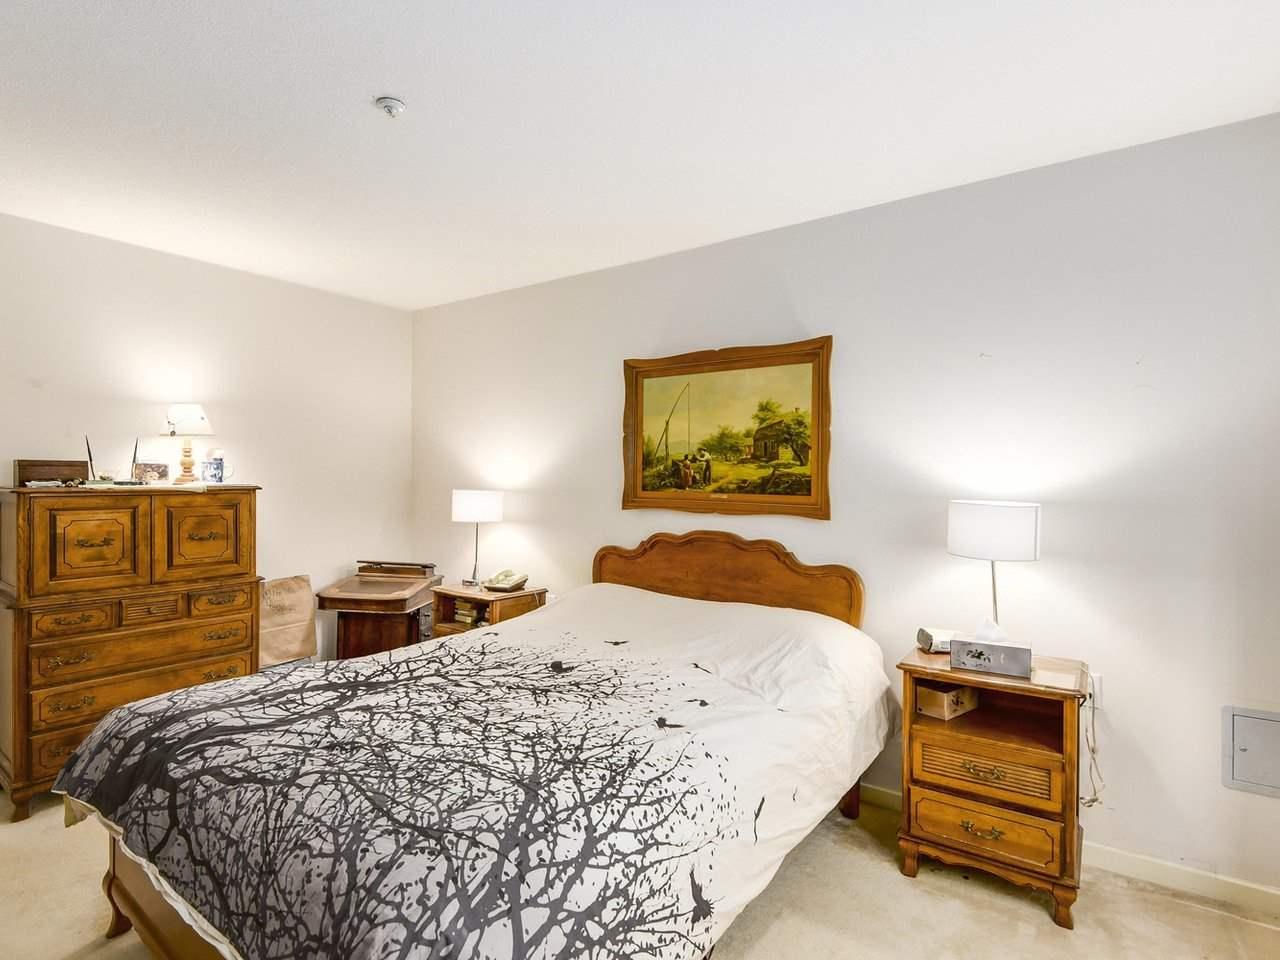 Condo Apartment at 108 2020 CEDAR VILLAGE CRESCENT, Unit 108, North Vancouver, British Columbia. Image 11